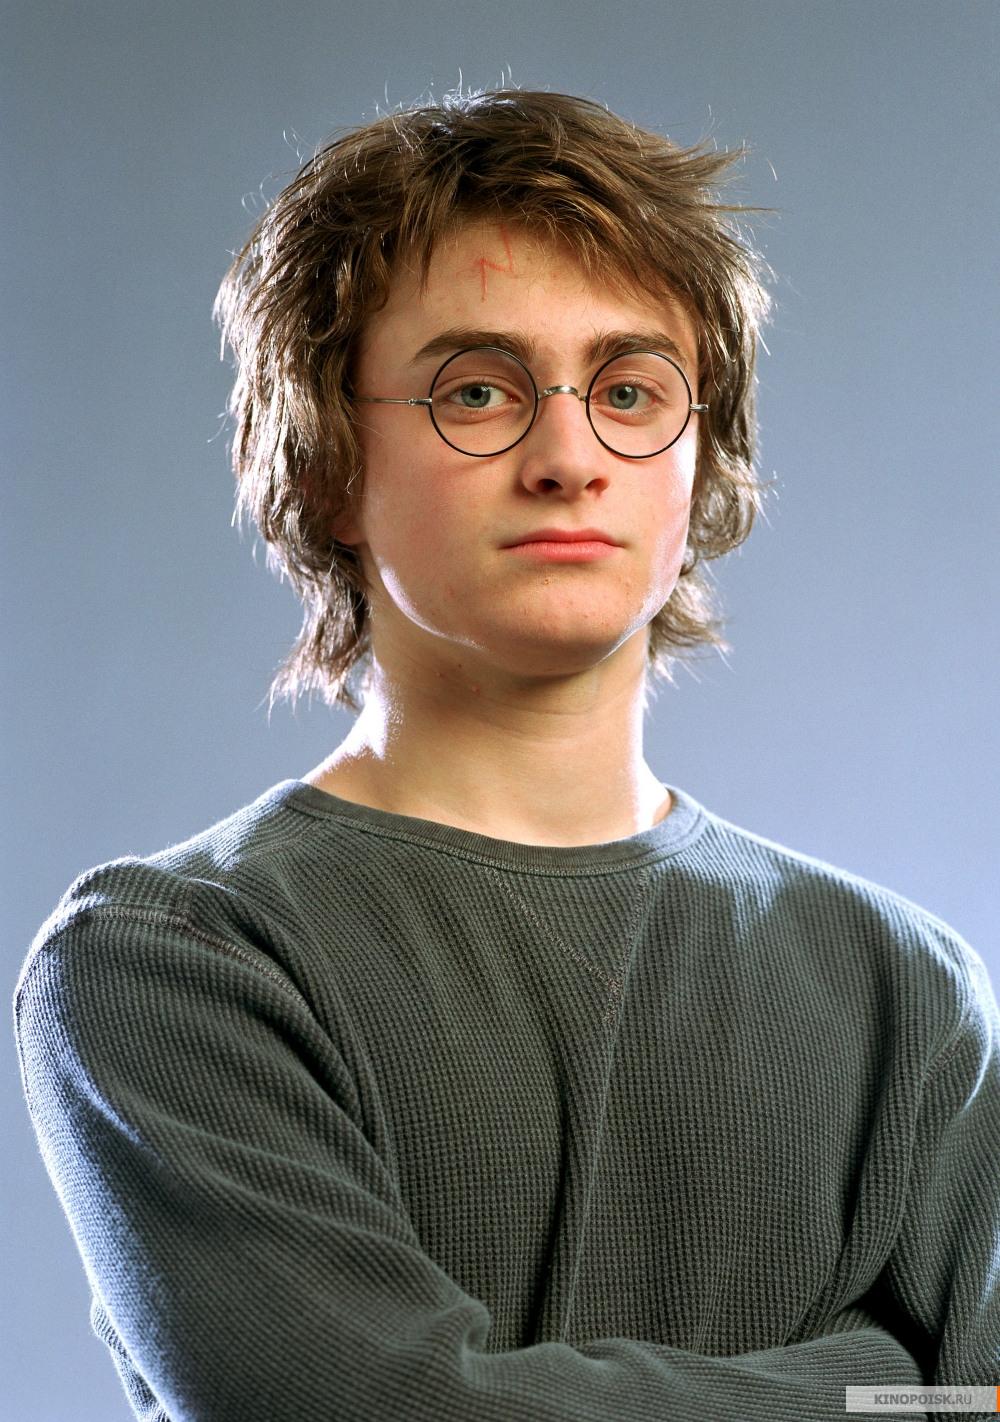 Фото: Гарри Поттер и Кубок огня / Промо-материалы фильма ...